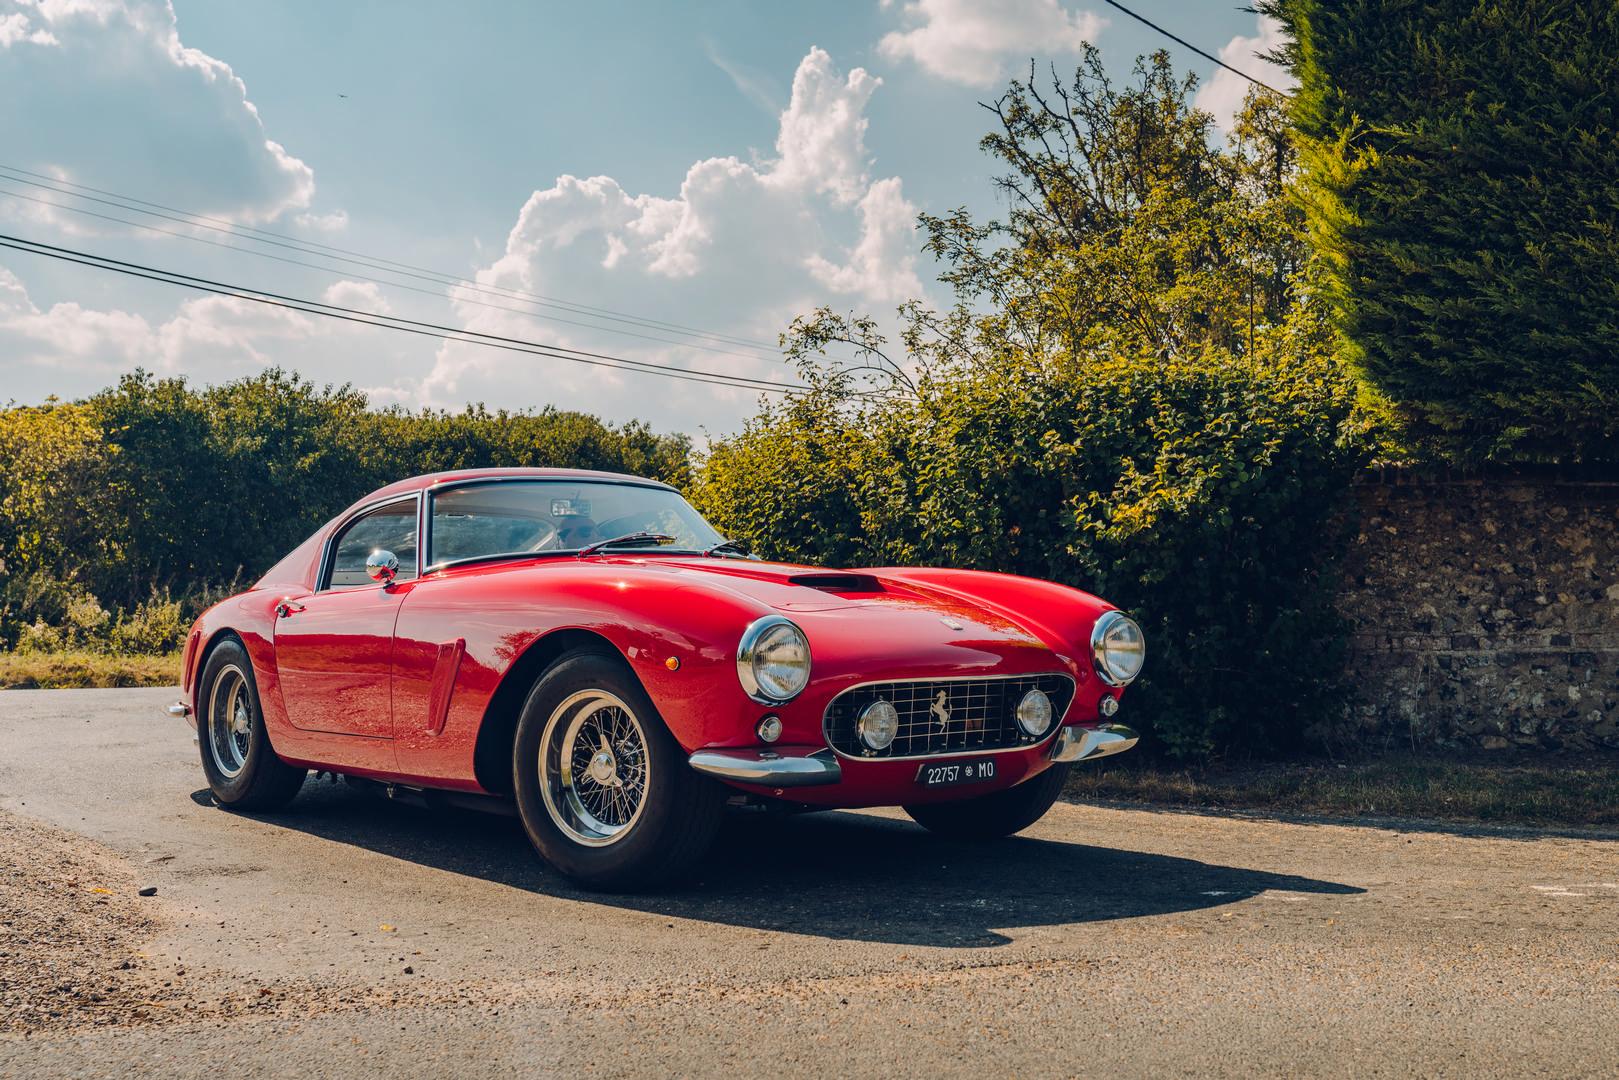 Ferrari 250 SWB Revival Review